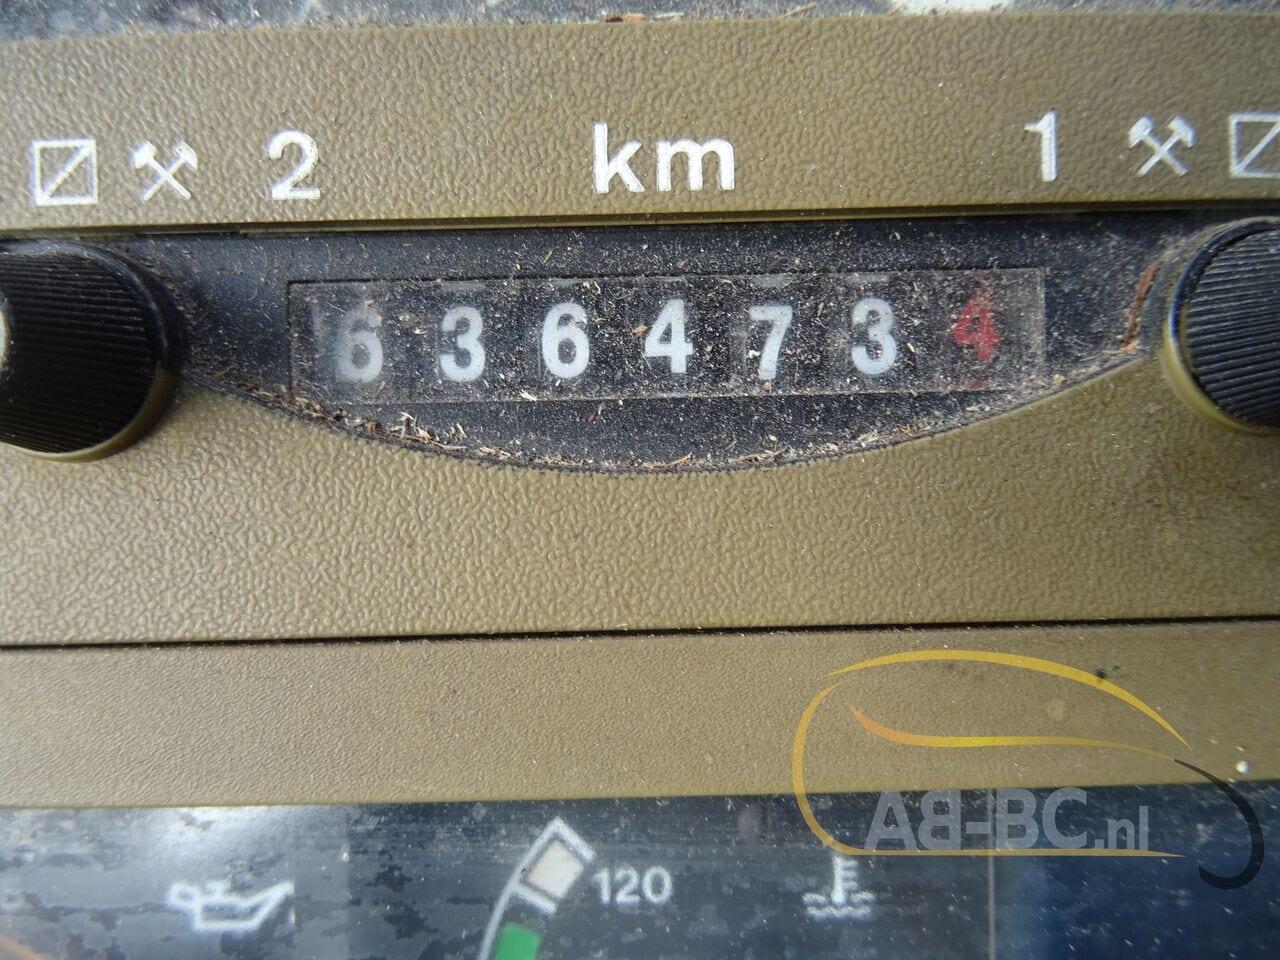 coach-busTEMSA-Safari-RD-65-Seats---1620311933484579103_big_f8f53509c1751bc41dc42fd3380c5179--21050617272795316700